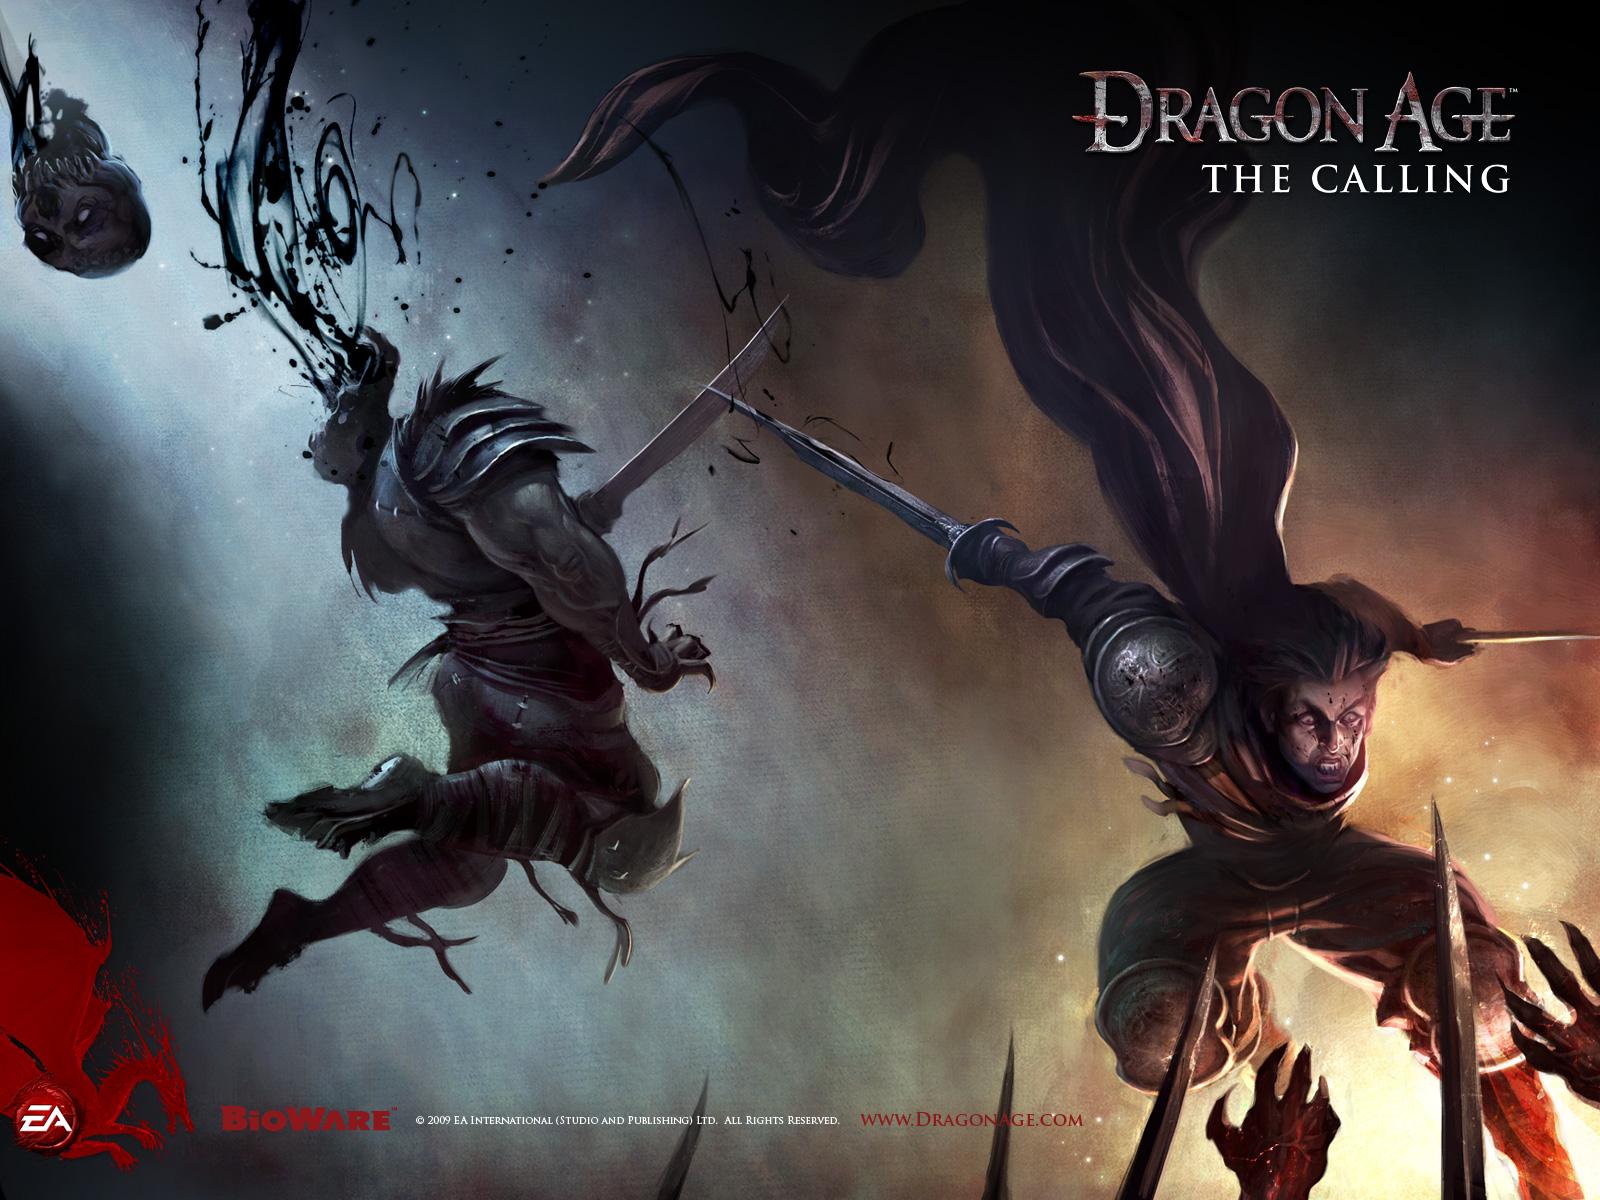 Dragon Age Mage Wallpaper Wallpapersafari